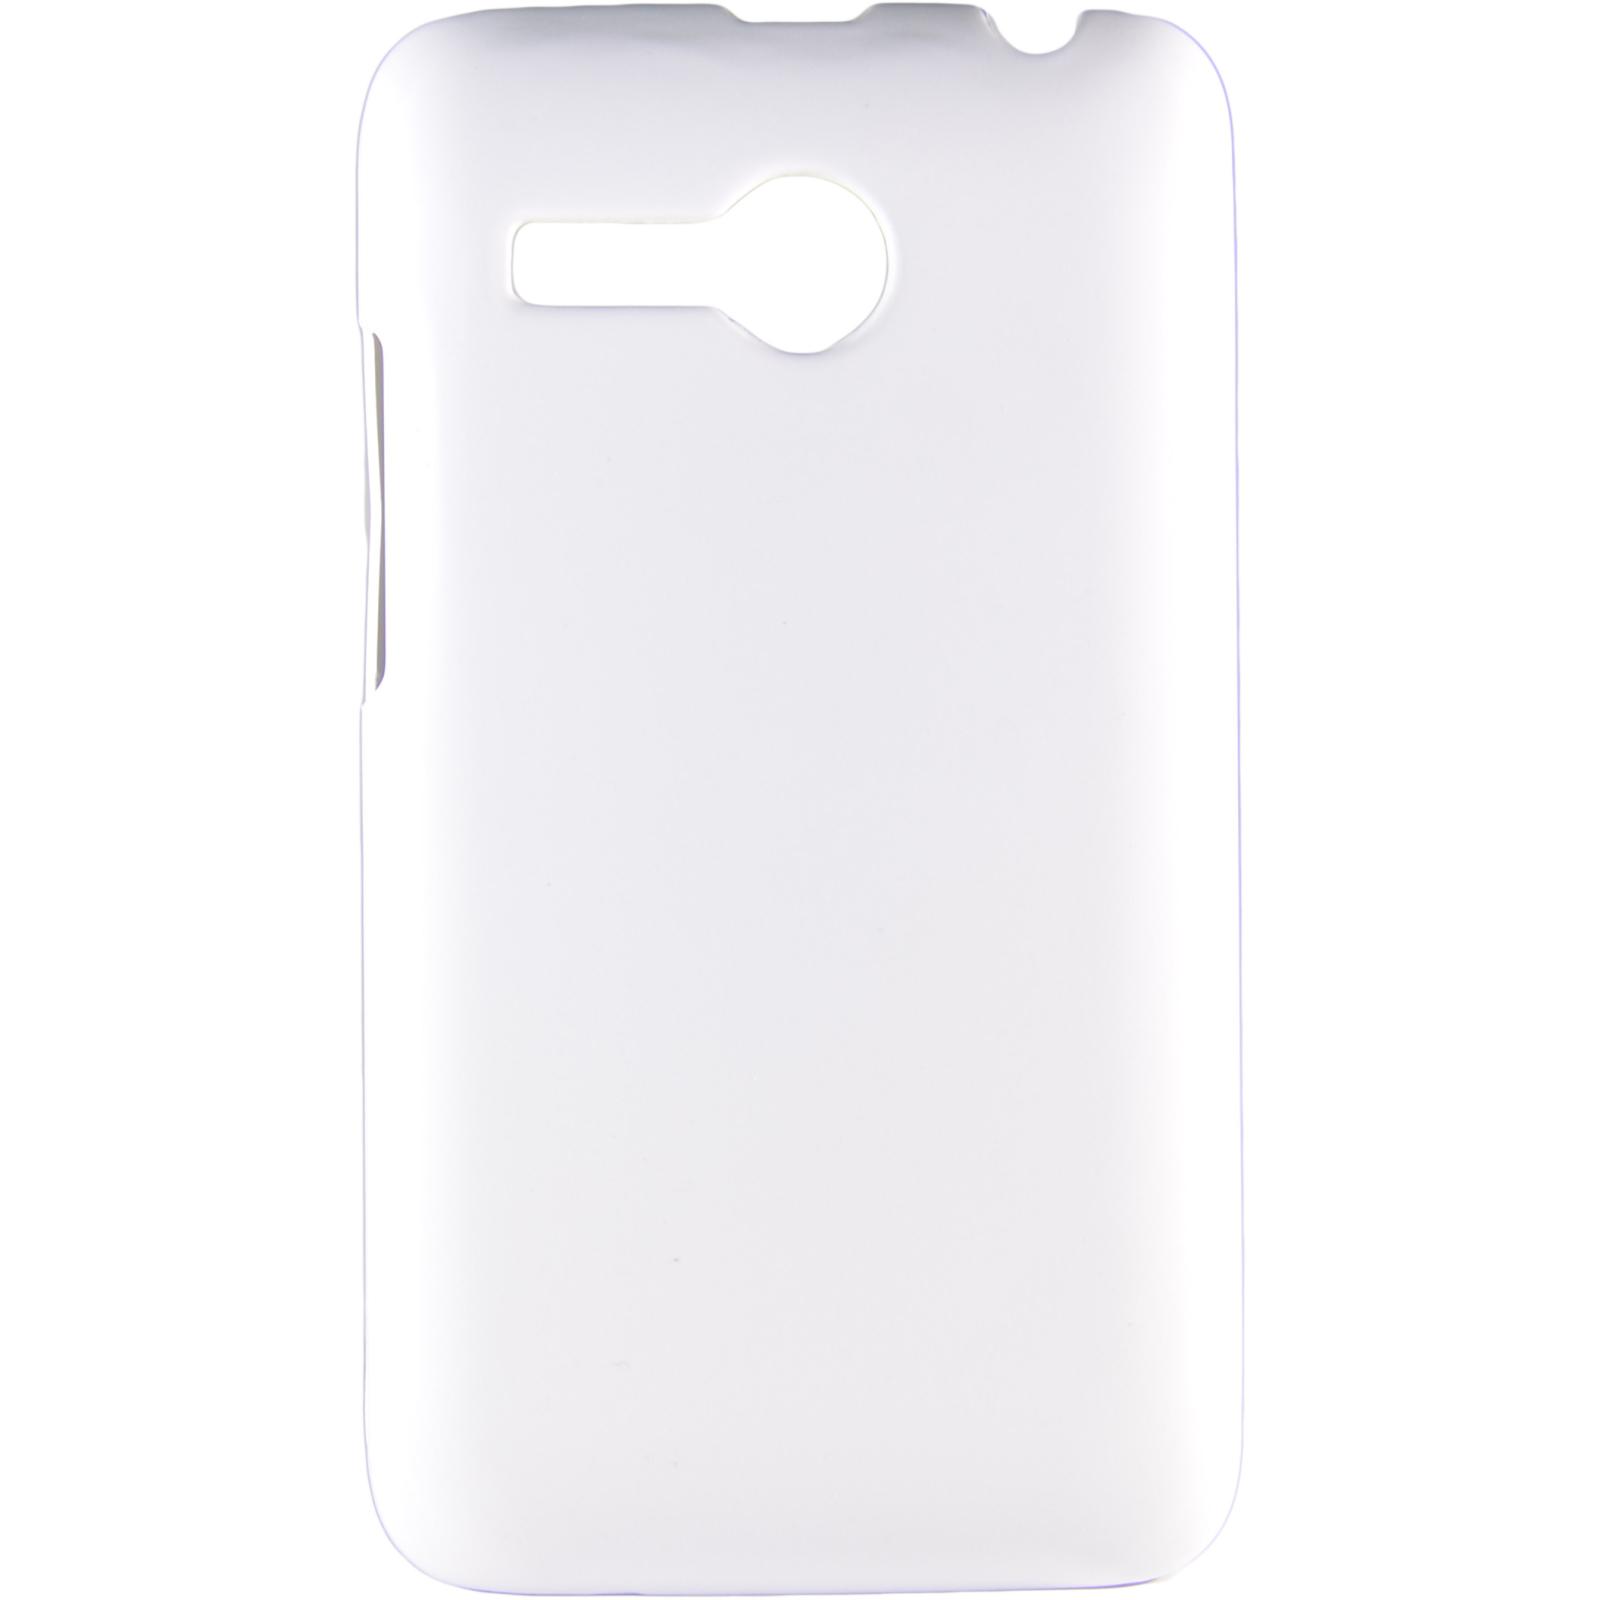 Чехол для моб. телефона Pro-case Lenovo A316 white (PCPCLenA316W)